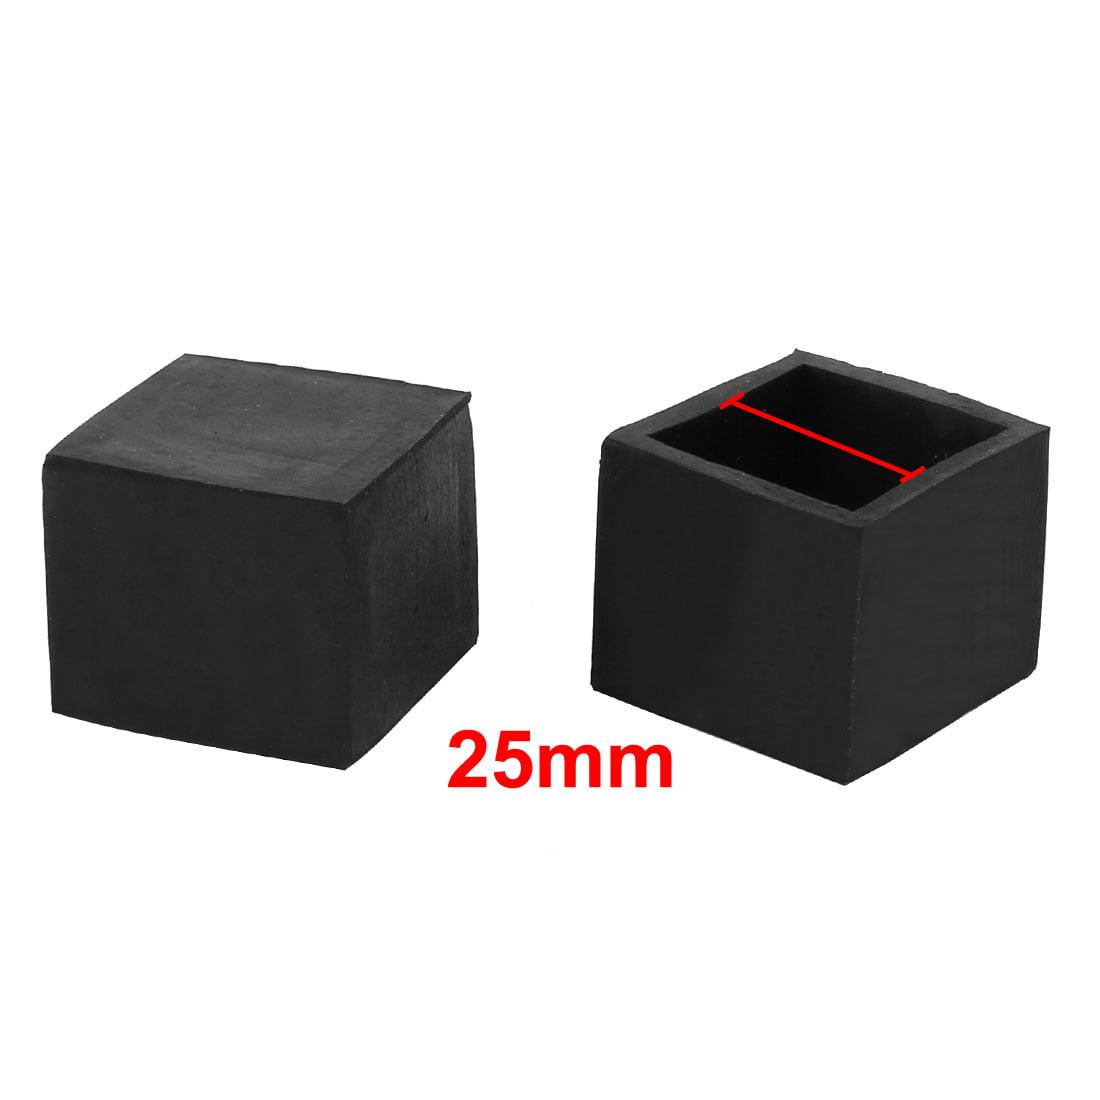 25mmx25mm Square Chair Leg Floor Protectors Table Feet Tips Covers Caps 8pcs - image 2 de 3